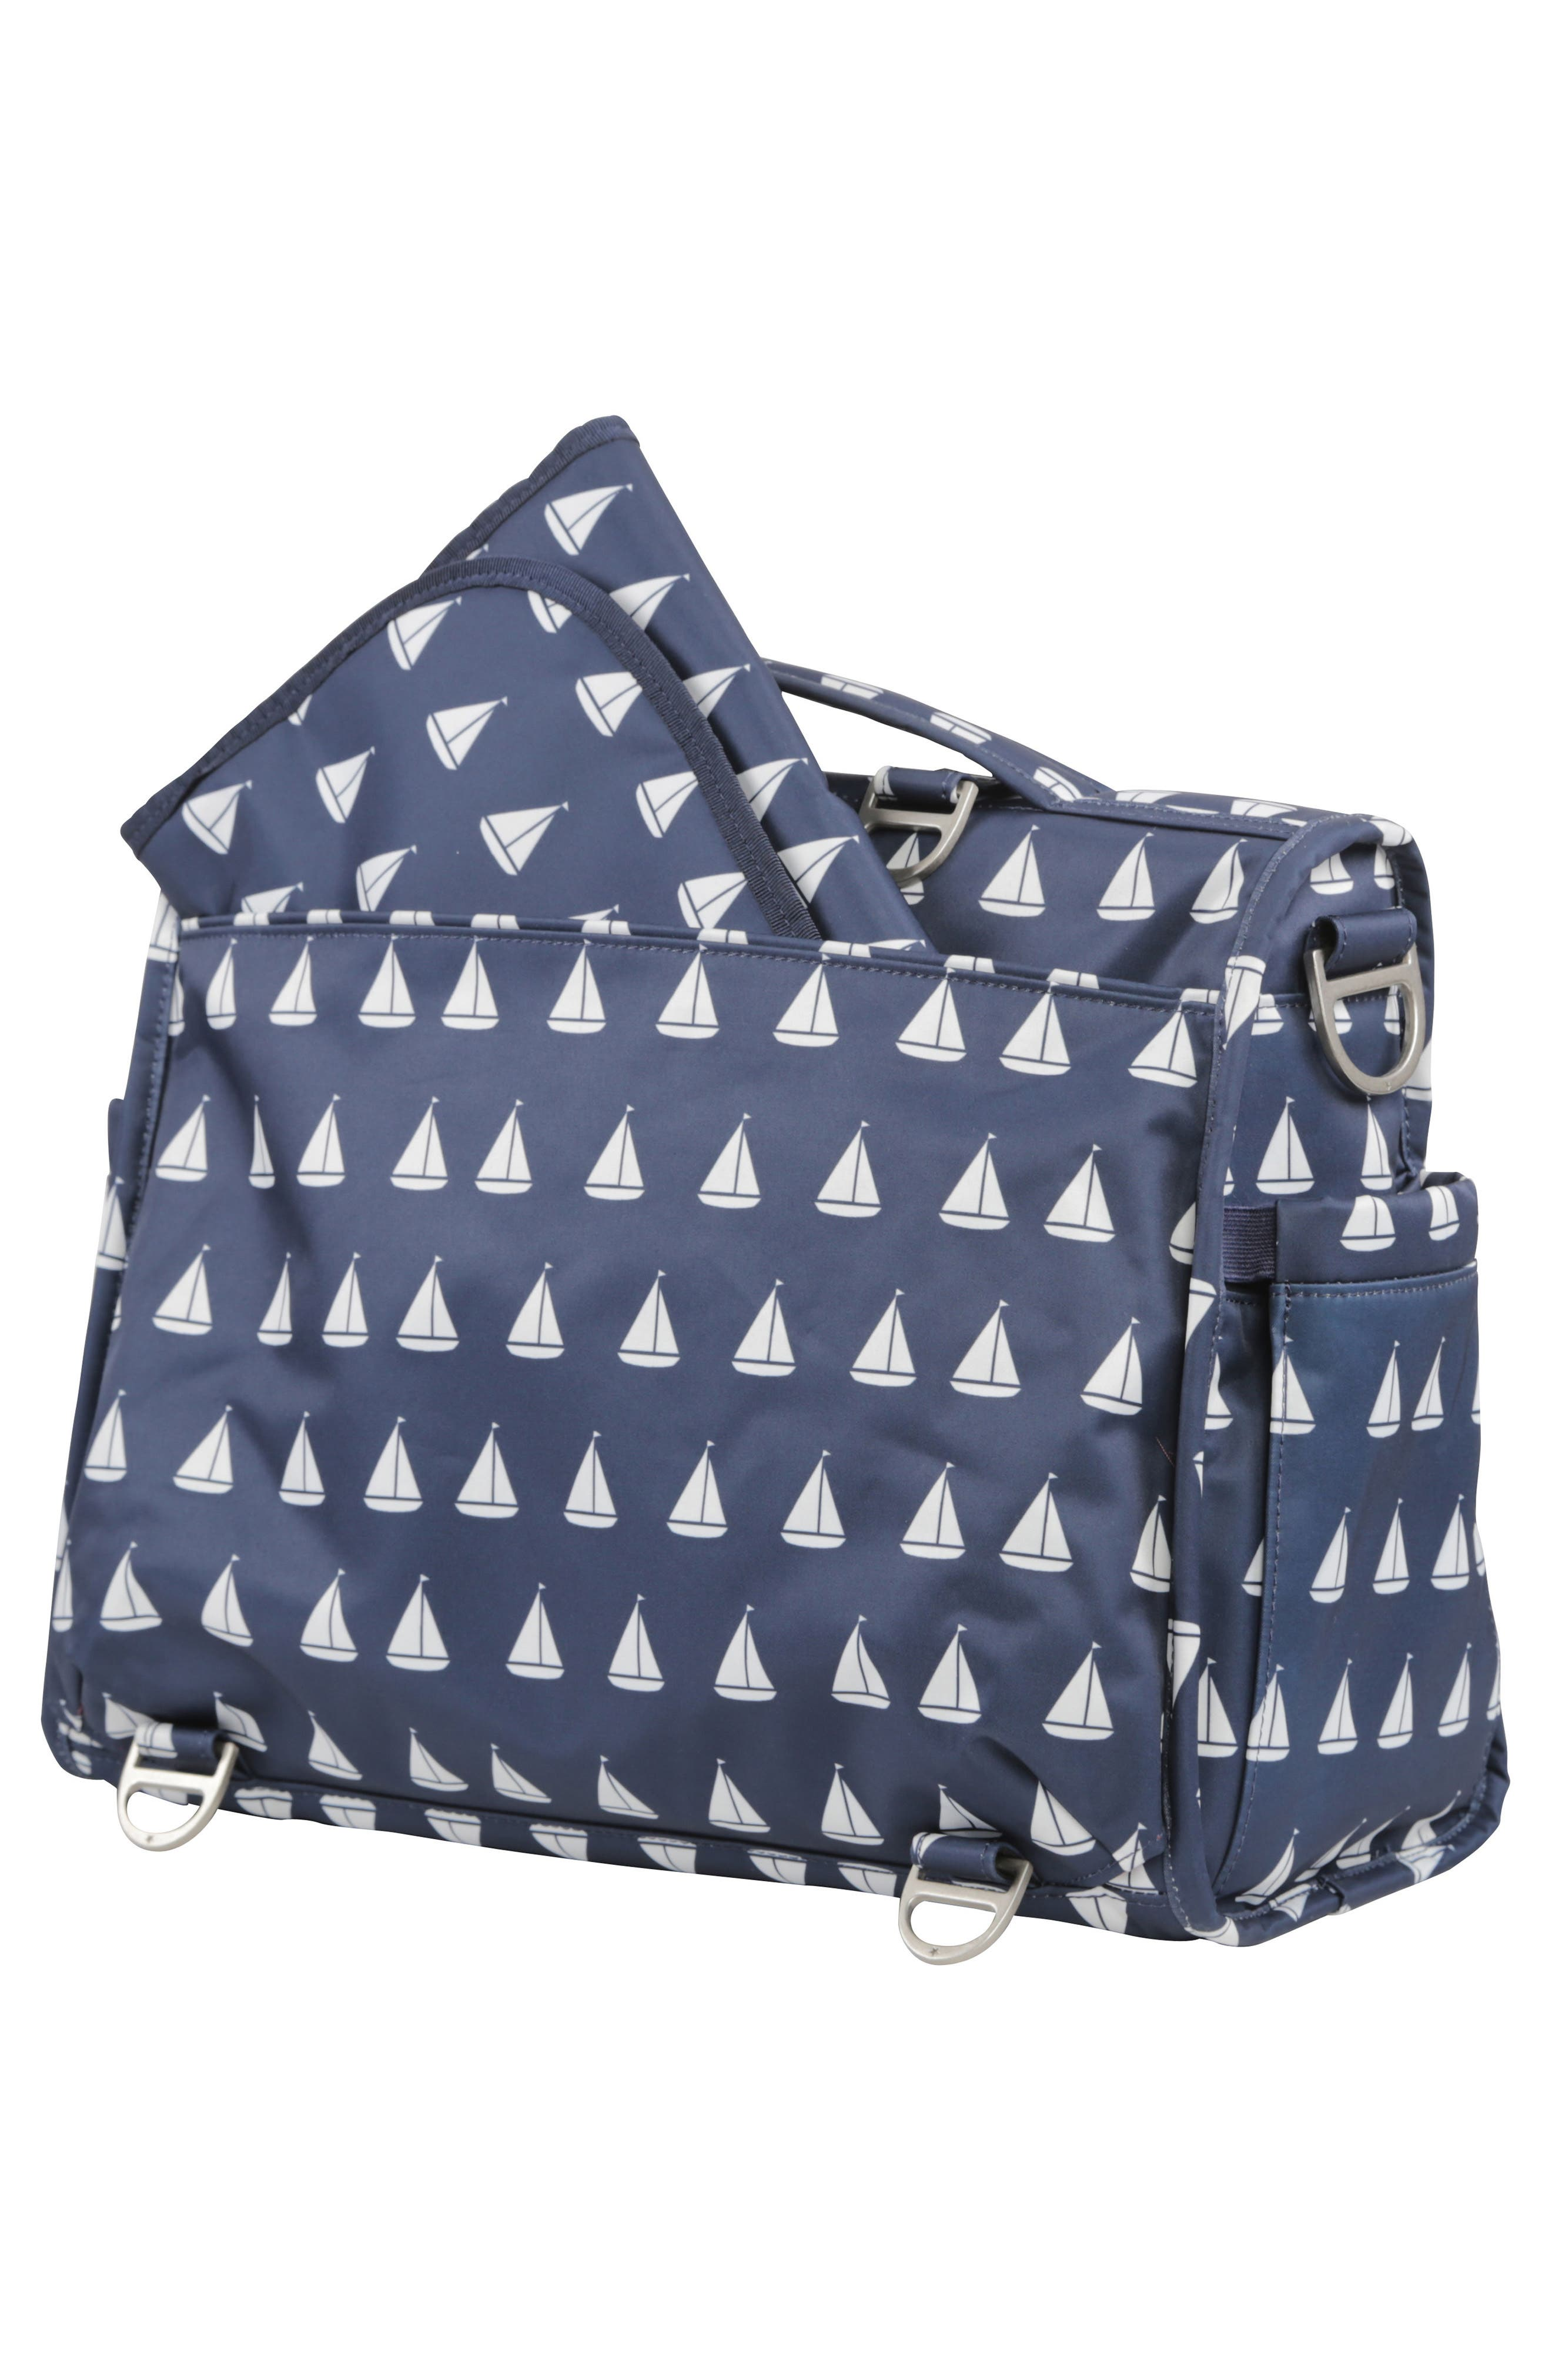 BFF - Coastal Collection Diaper Bag,                             Alternate thumbnail 10, color,